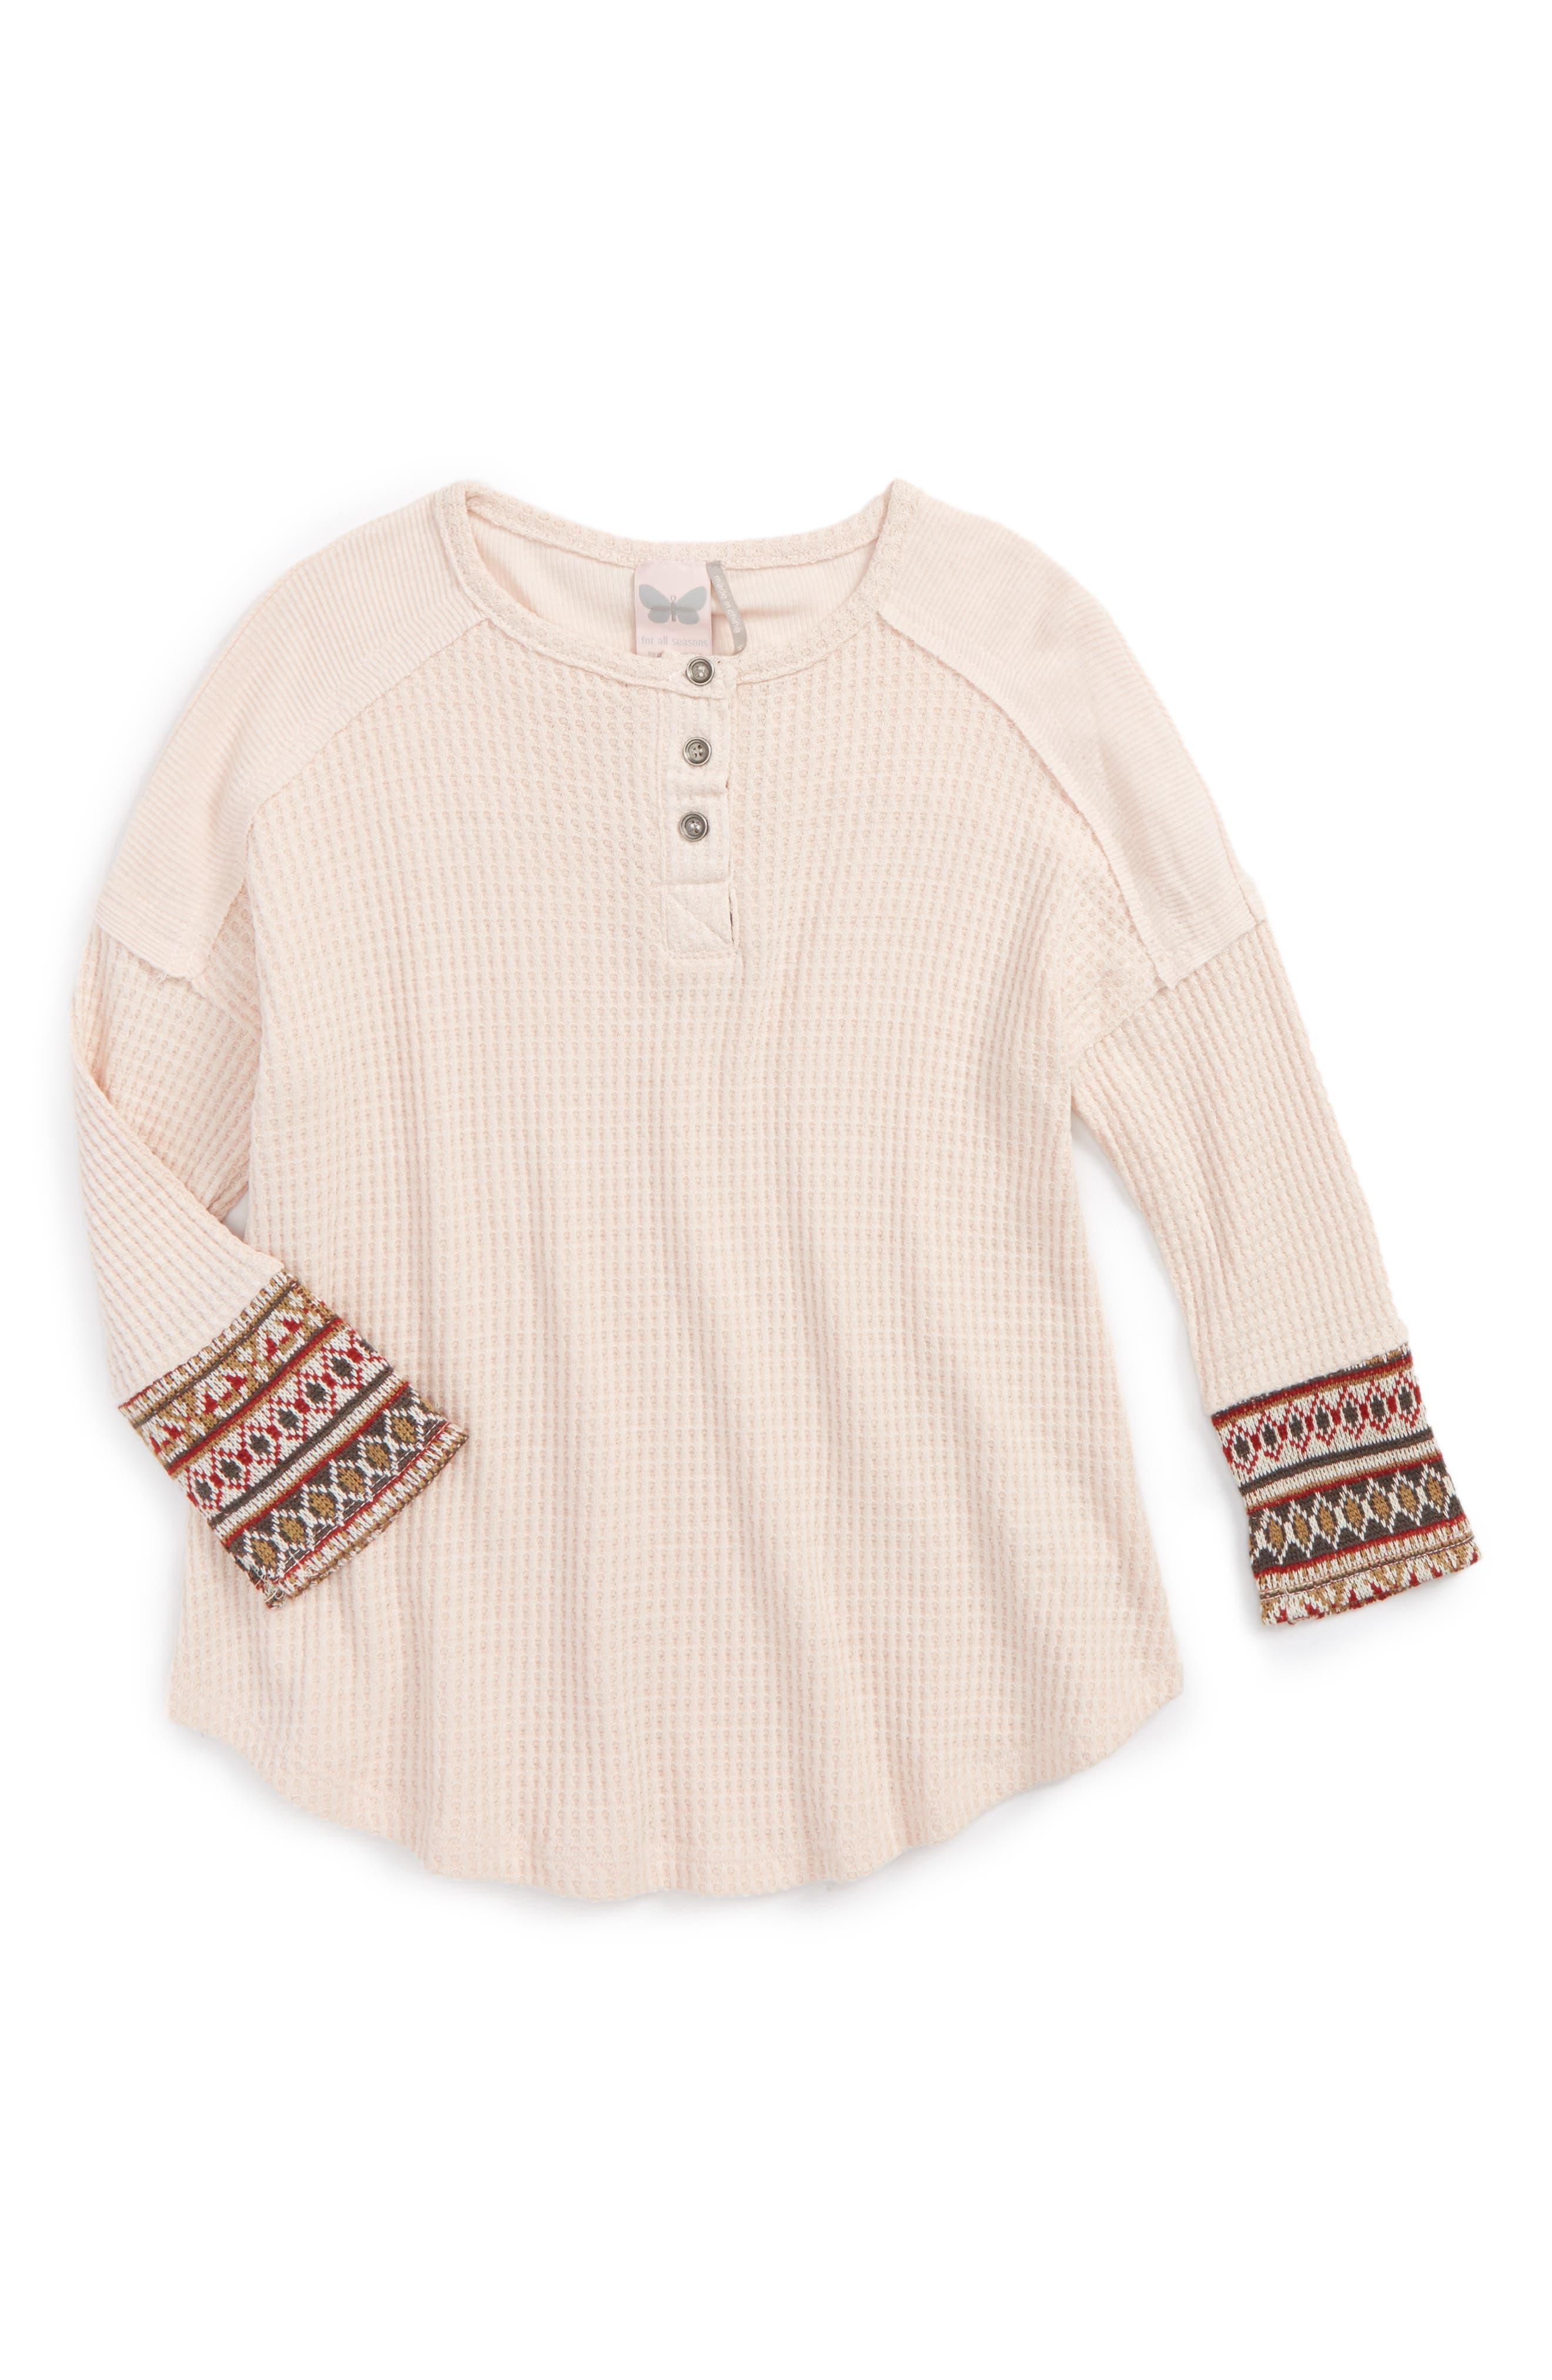 Fairisle Thermal Shirt,                             Main thumbnail 1, color,                             902